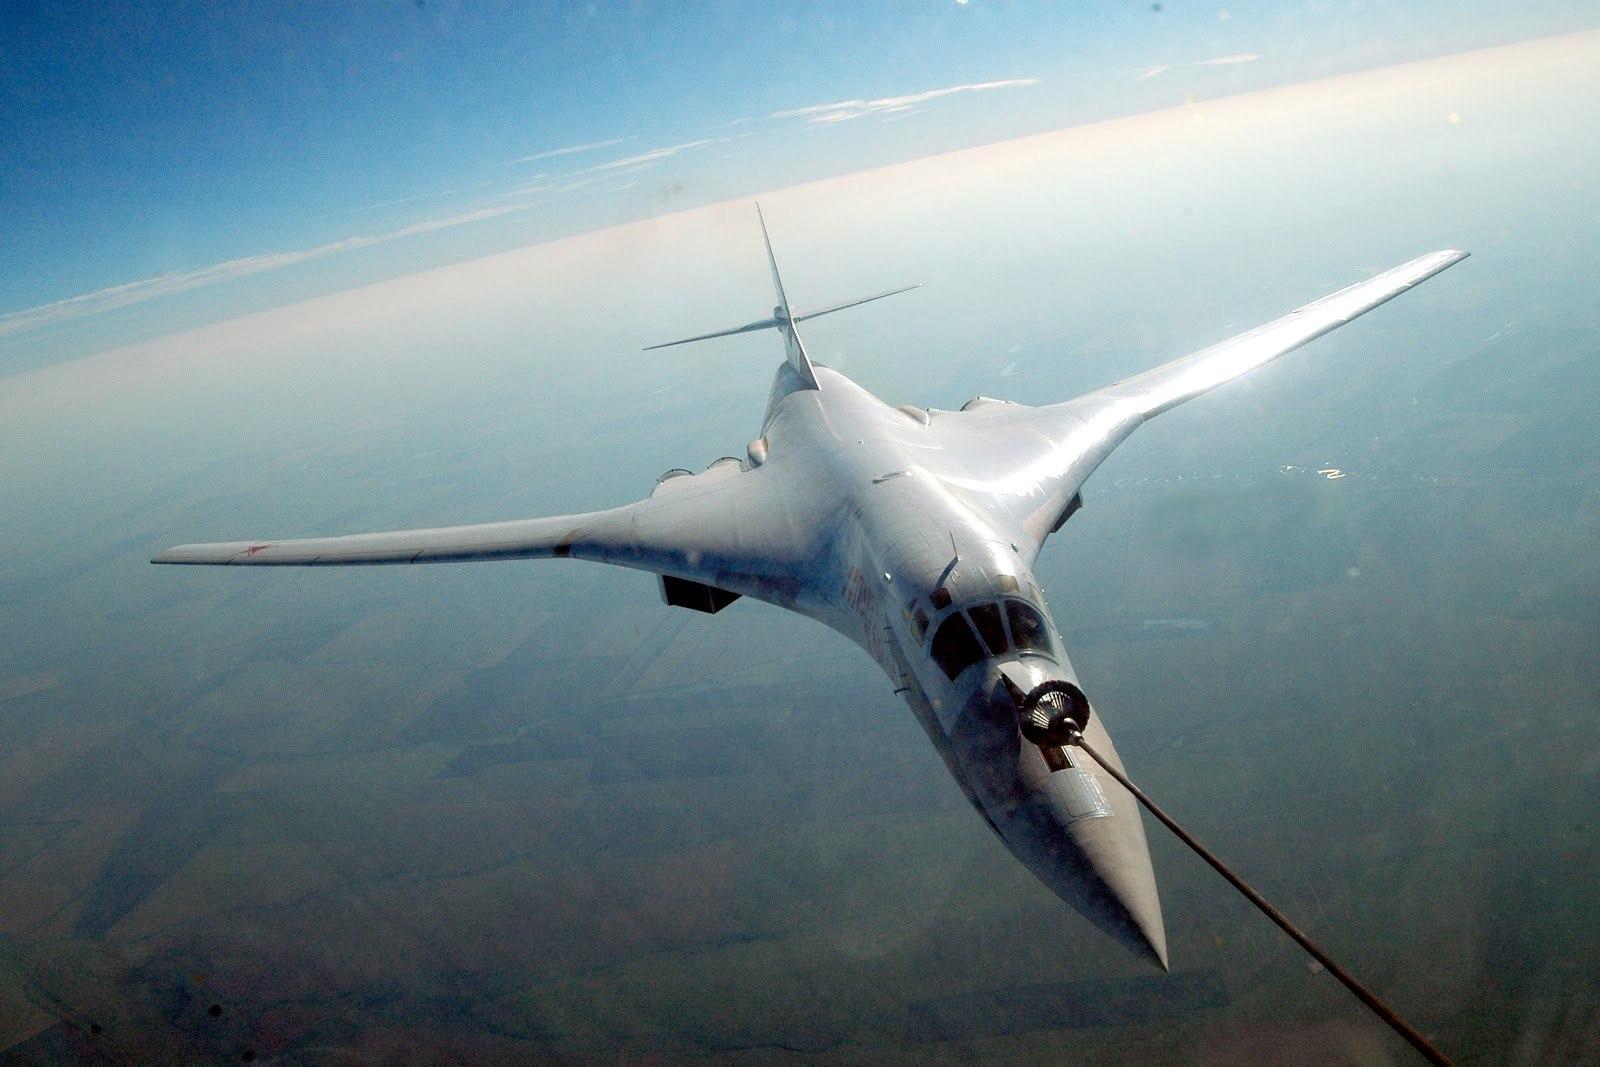 часто самолет лебедь картинки протусили